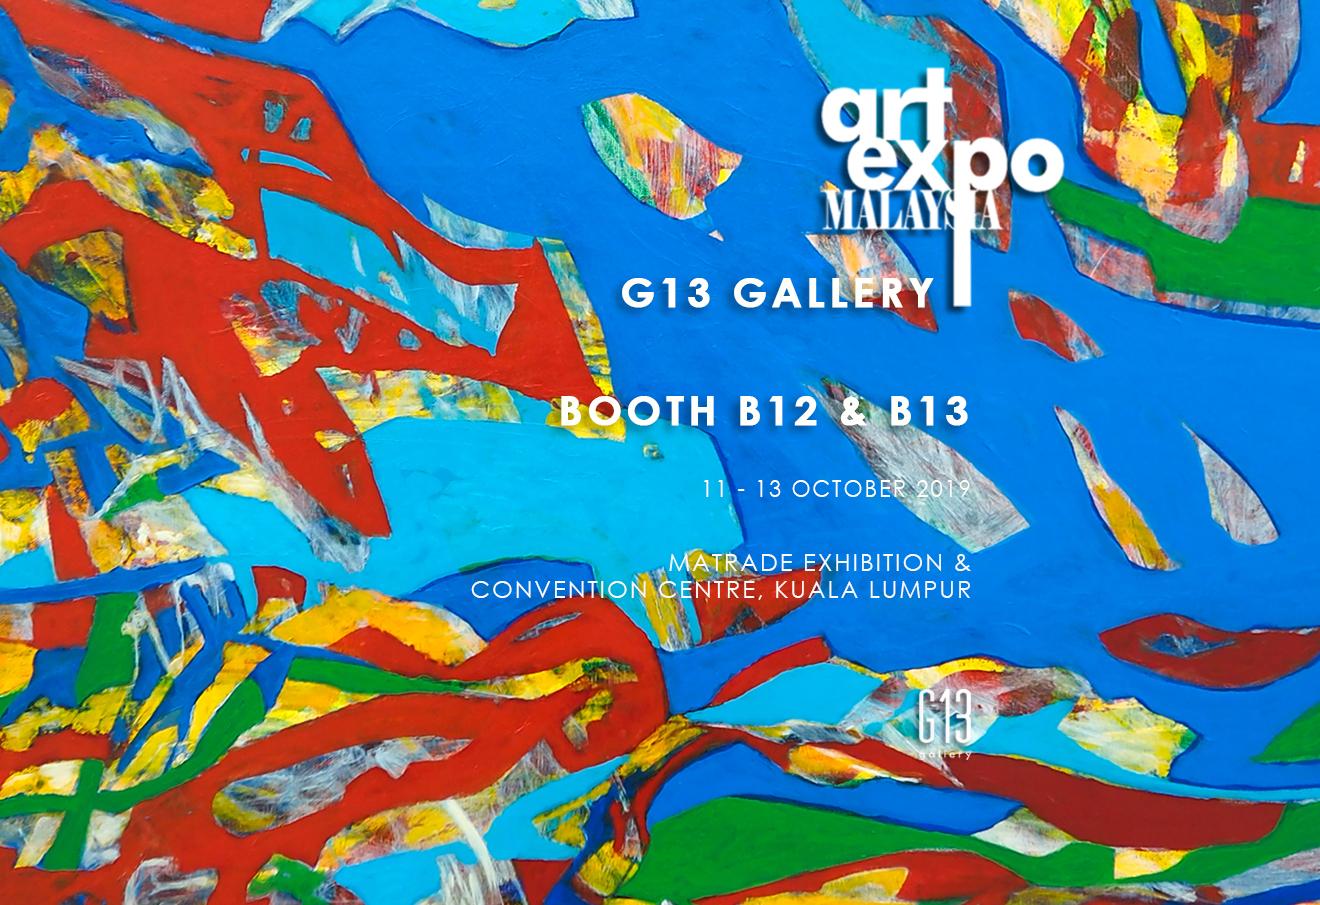 Art Expo Malaysia 2019 @ BOOTH B12 & B13